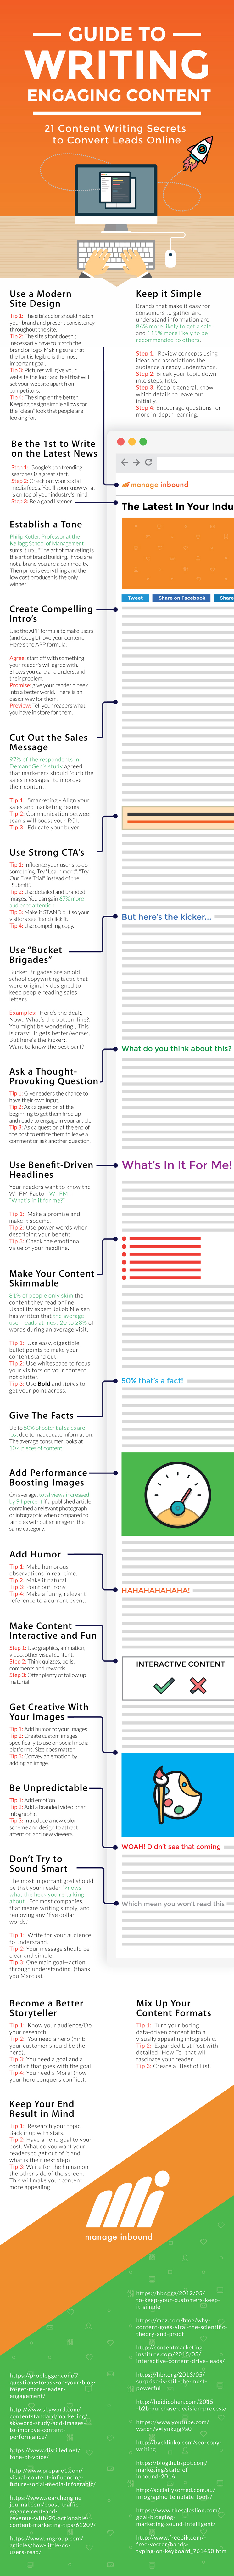 Content-Marketing-Secrets